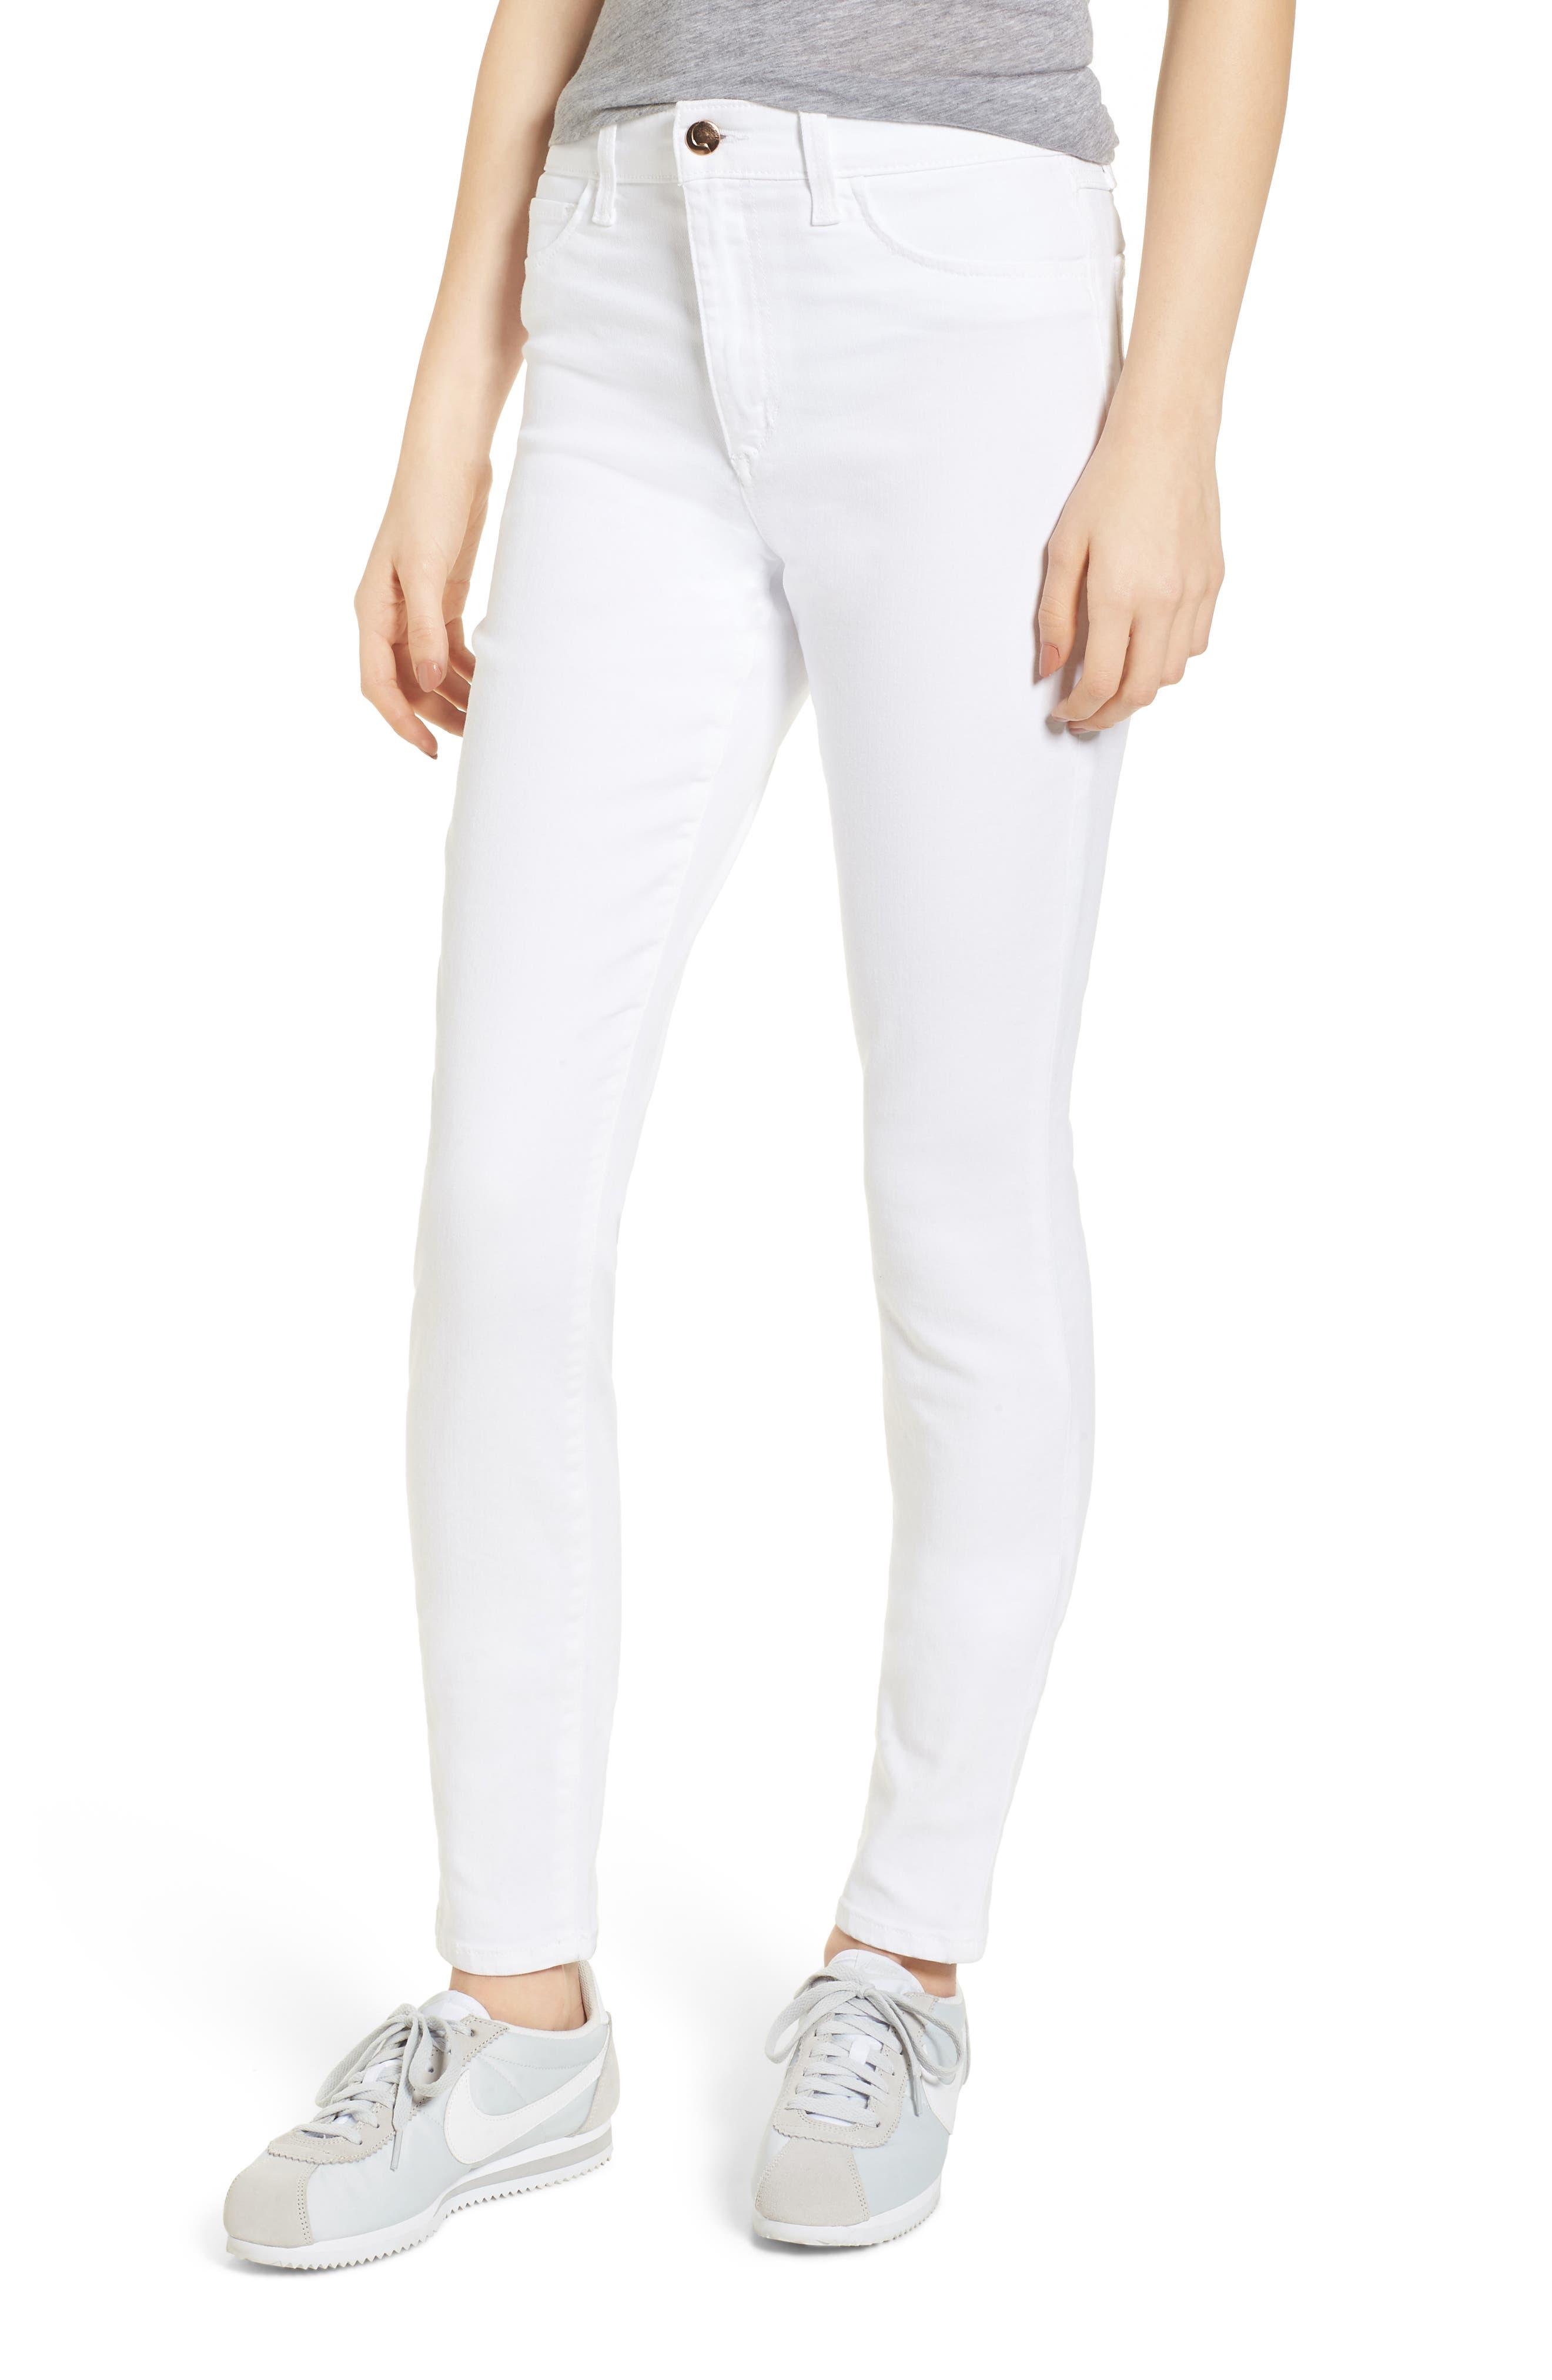 Charlie Skinny Jeans,                         Main,                         color, 120